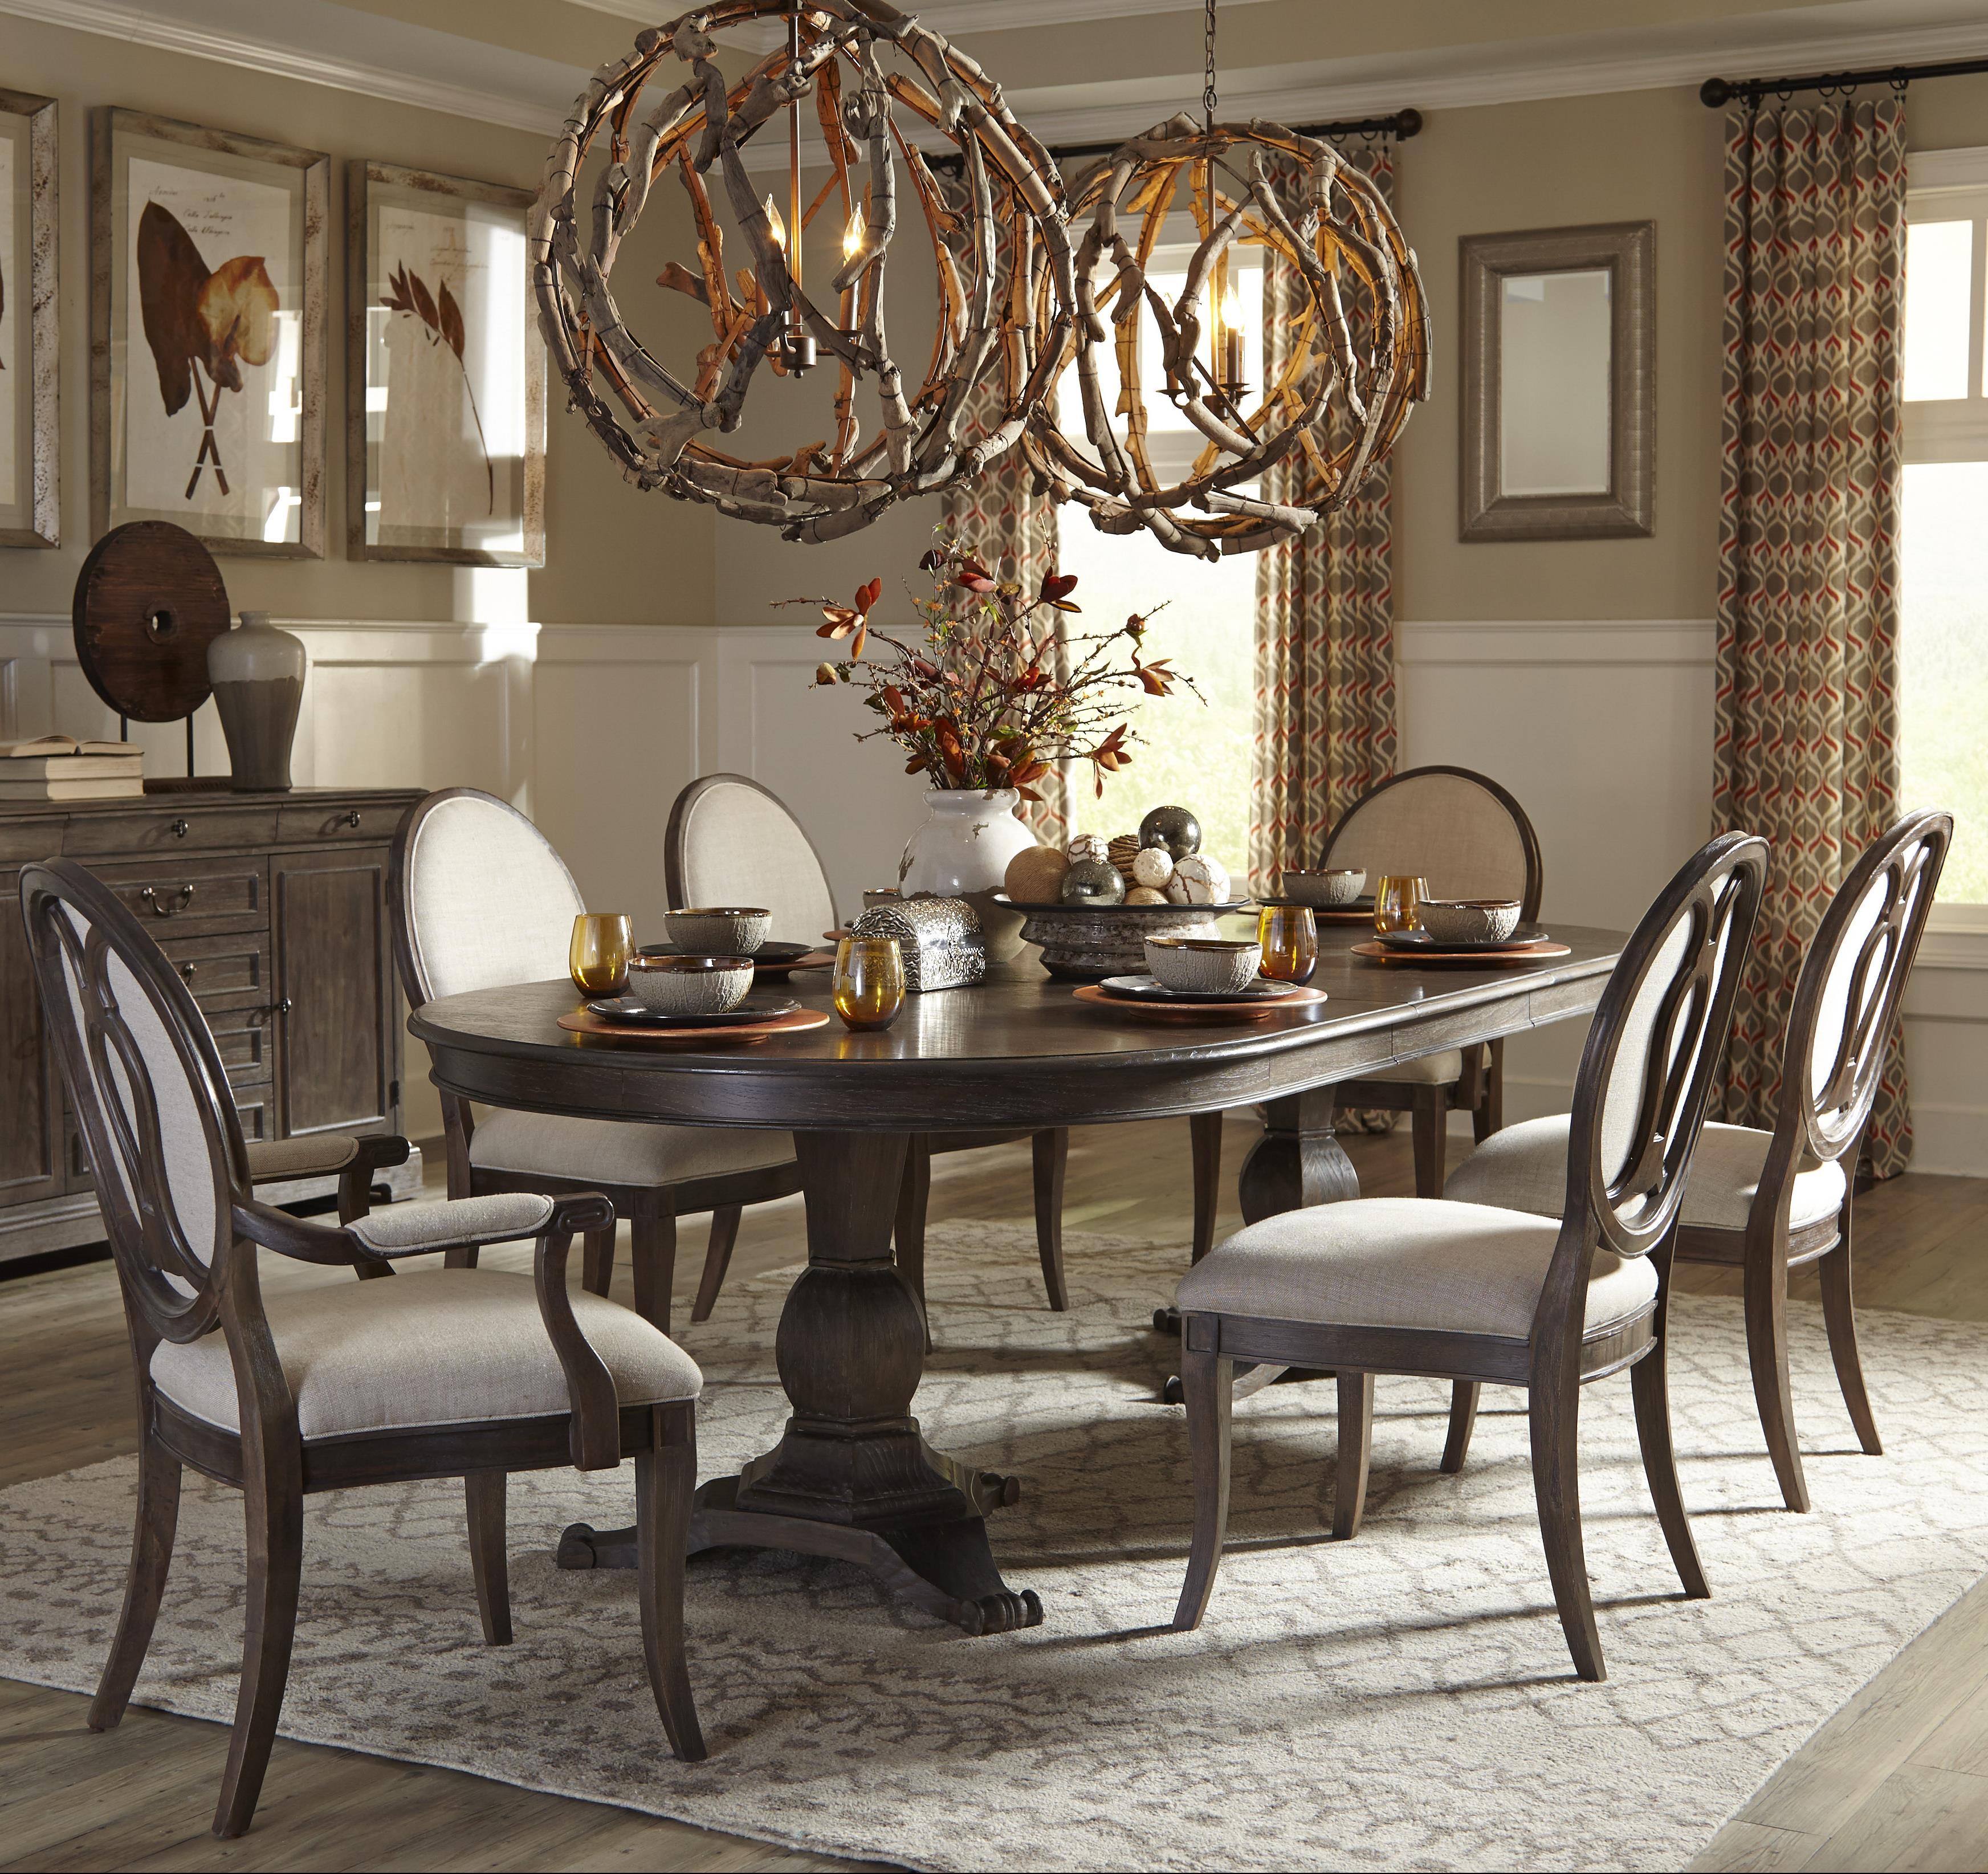 a r t furniture inc saint germain 7 piece double pedestal dining table set hudson 39 s furniture. Black Bedroom Furniture Sets. Home Design Ideas